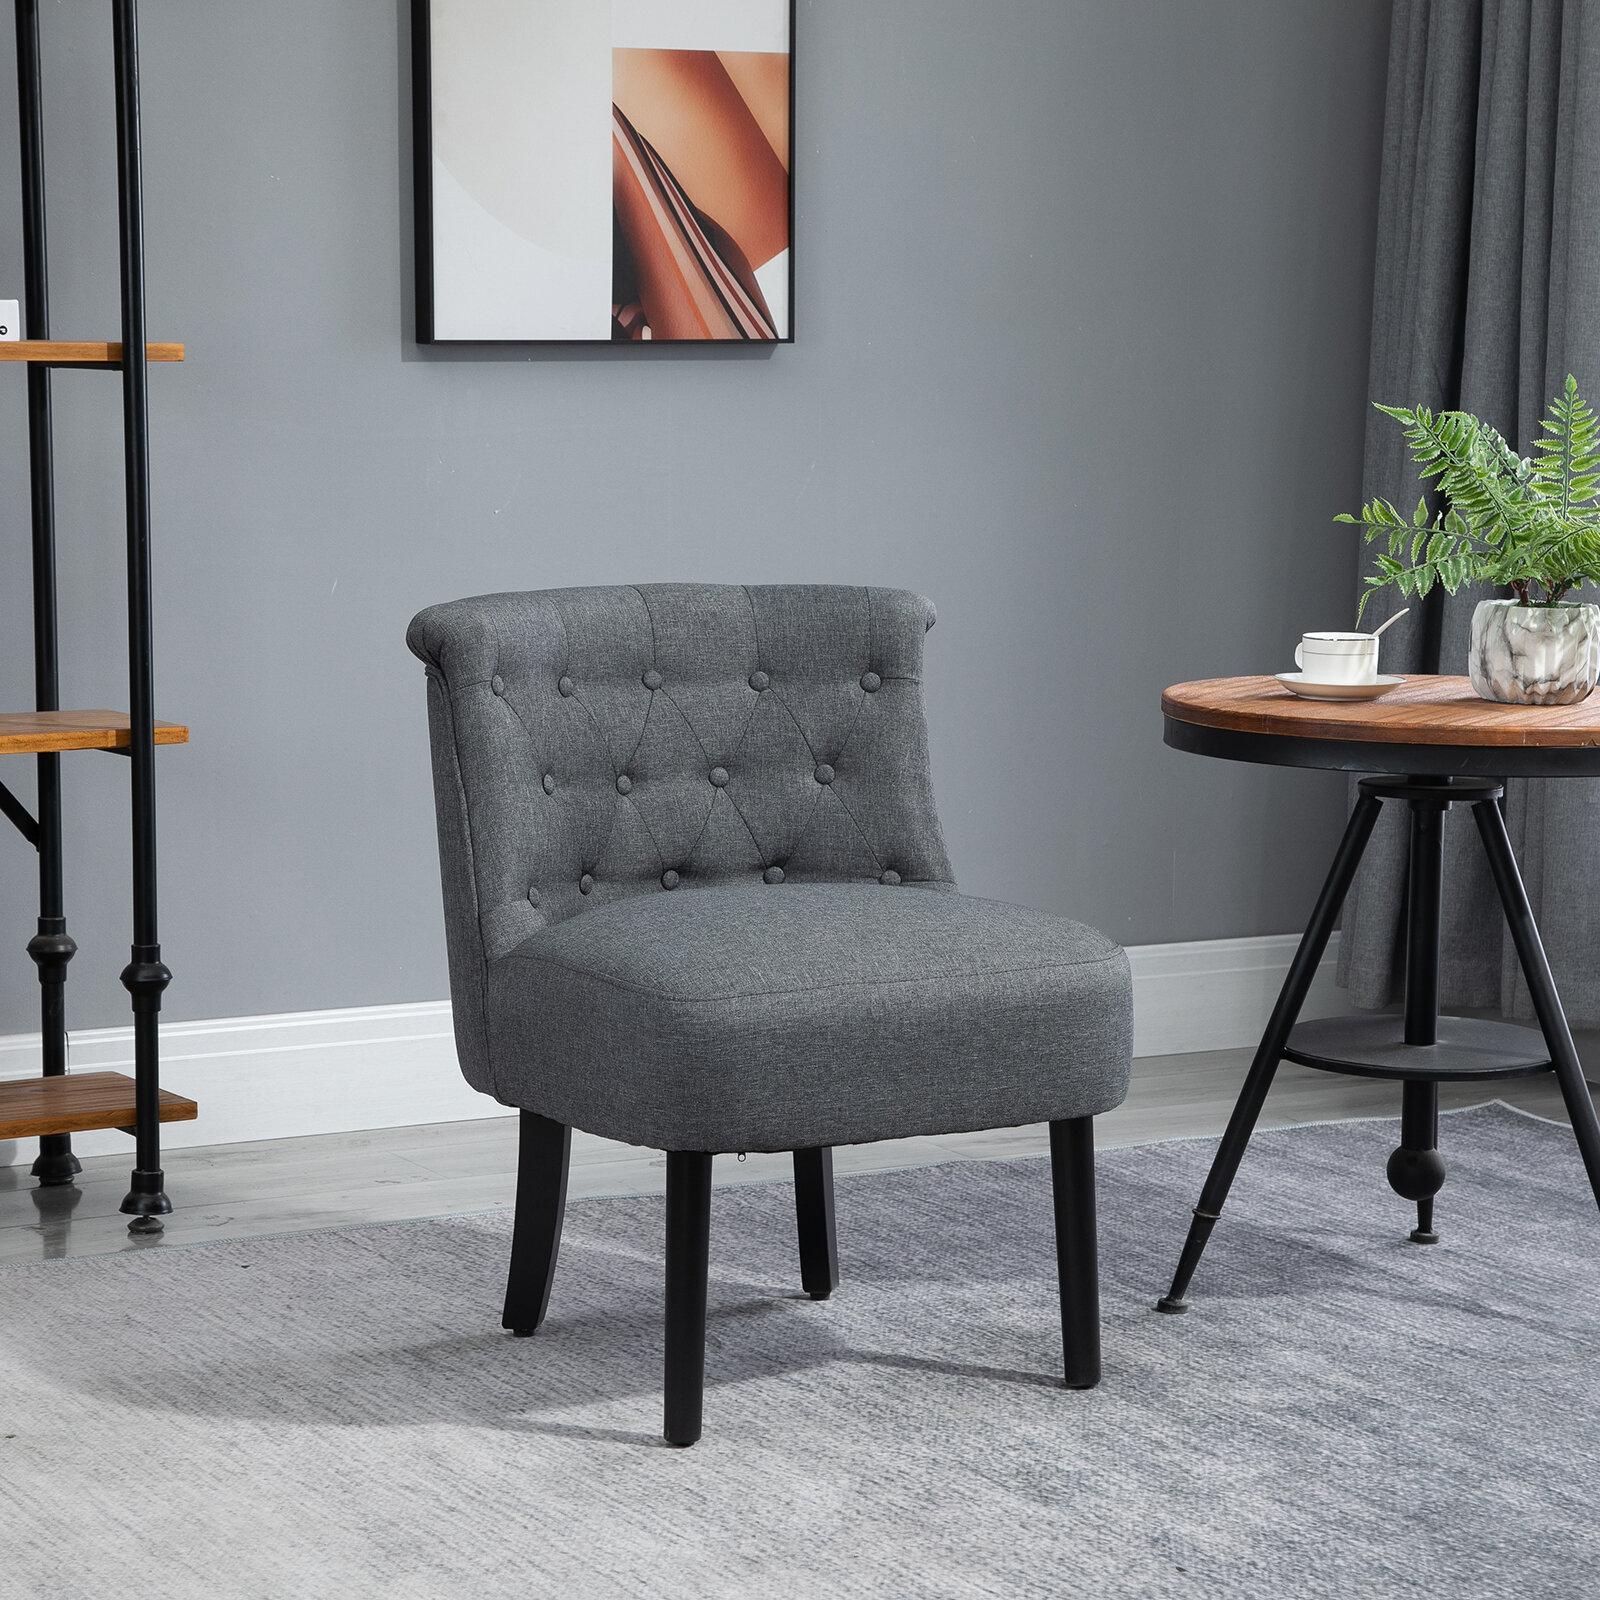 Otway Slipper Chair With Regard To Aniruddha Slipper Chairs (View 6 of 15)